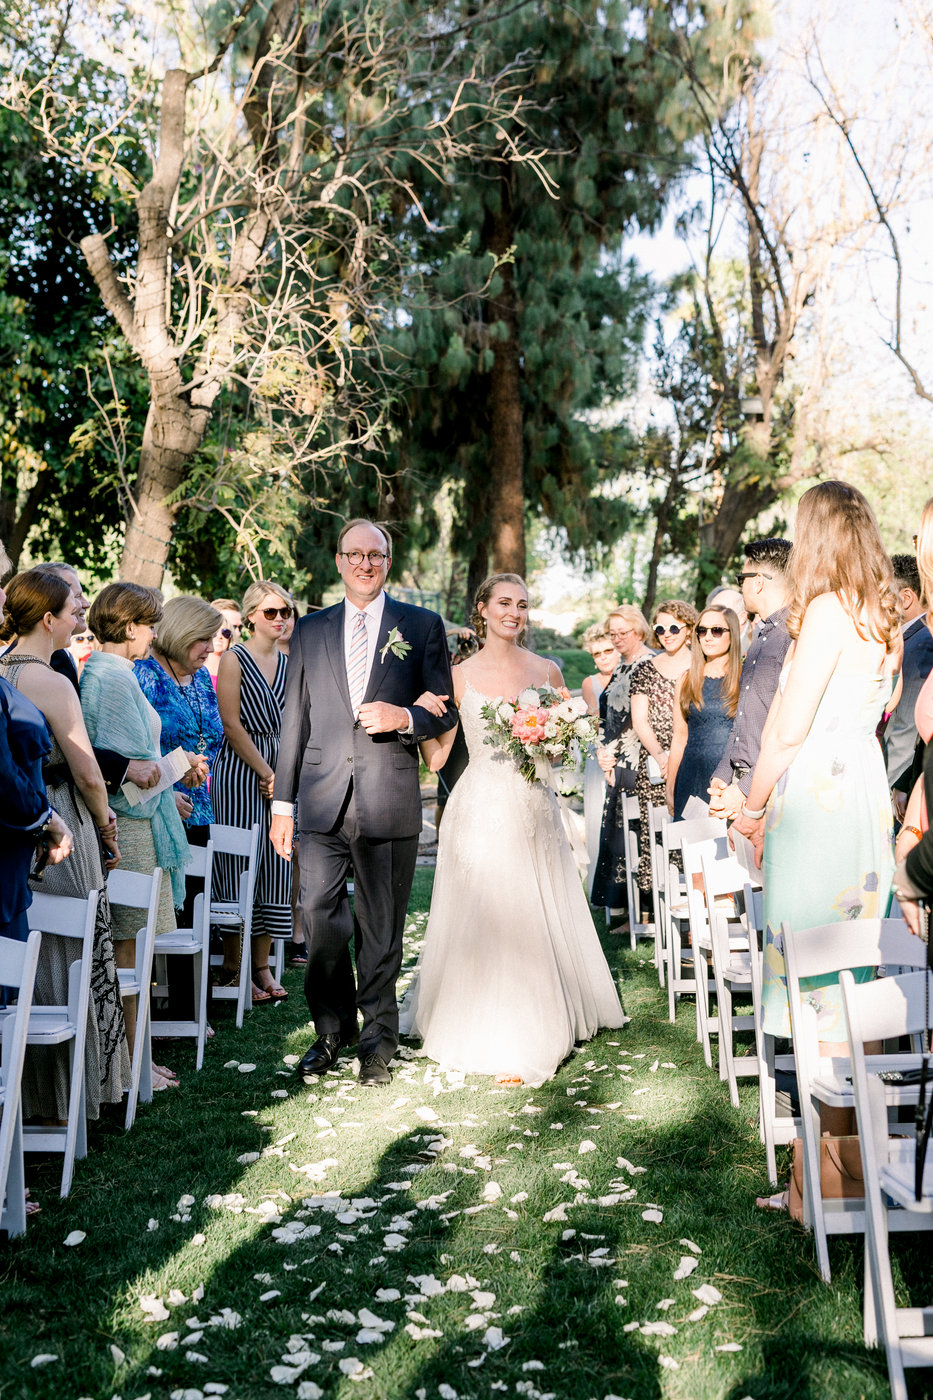 Charming Outdoor Wedding Ceremony